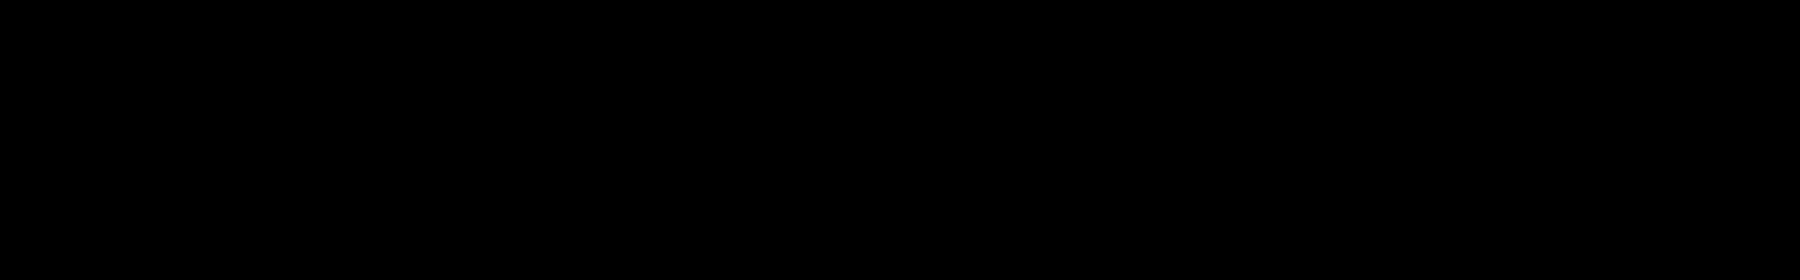 Stoner Lyfe audio waveform